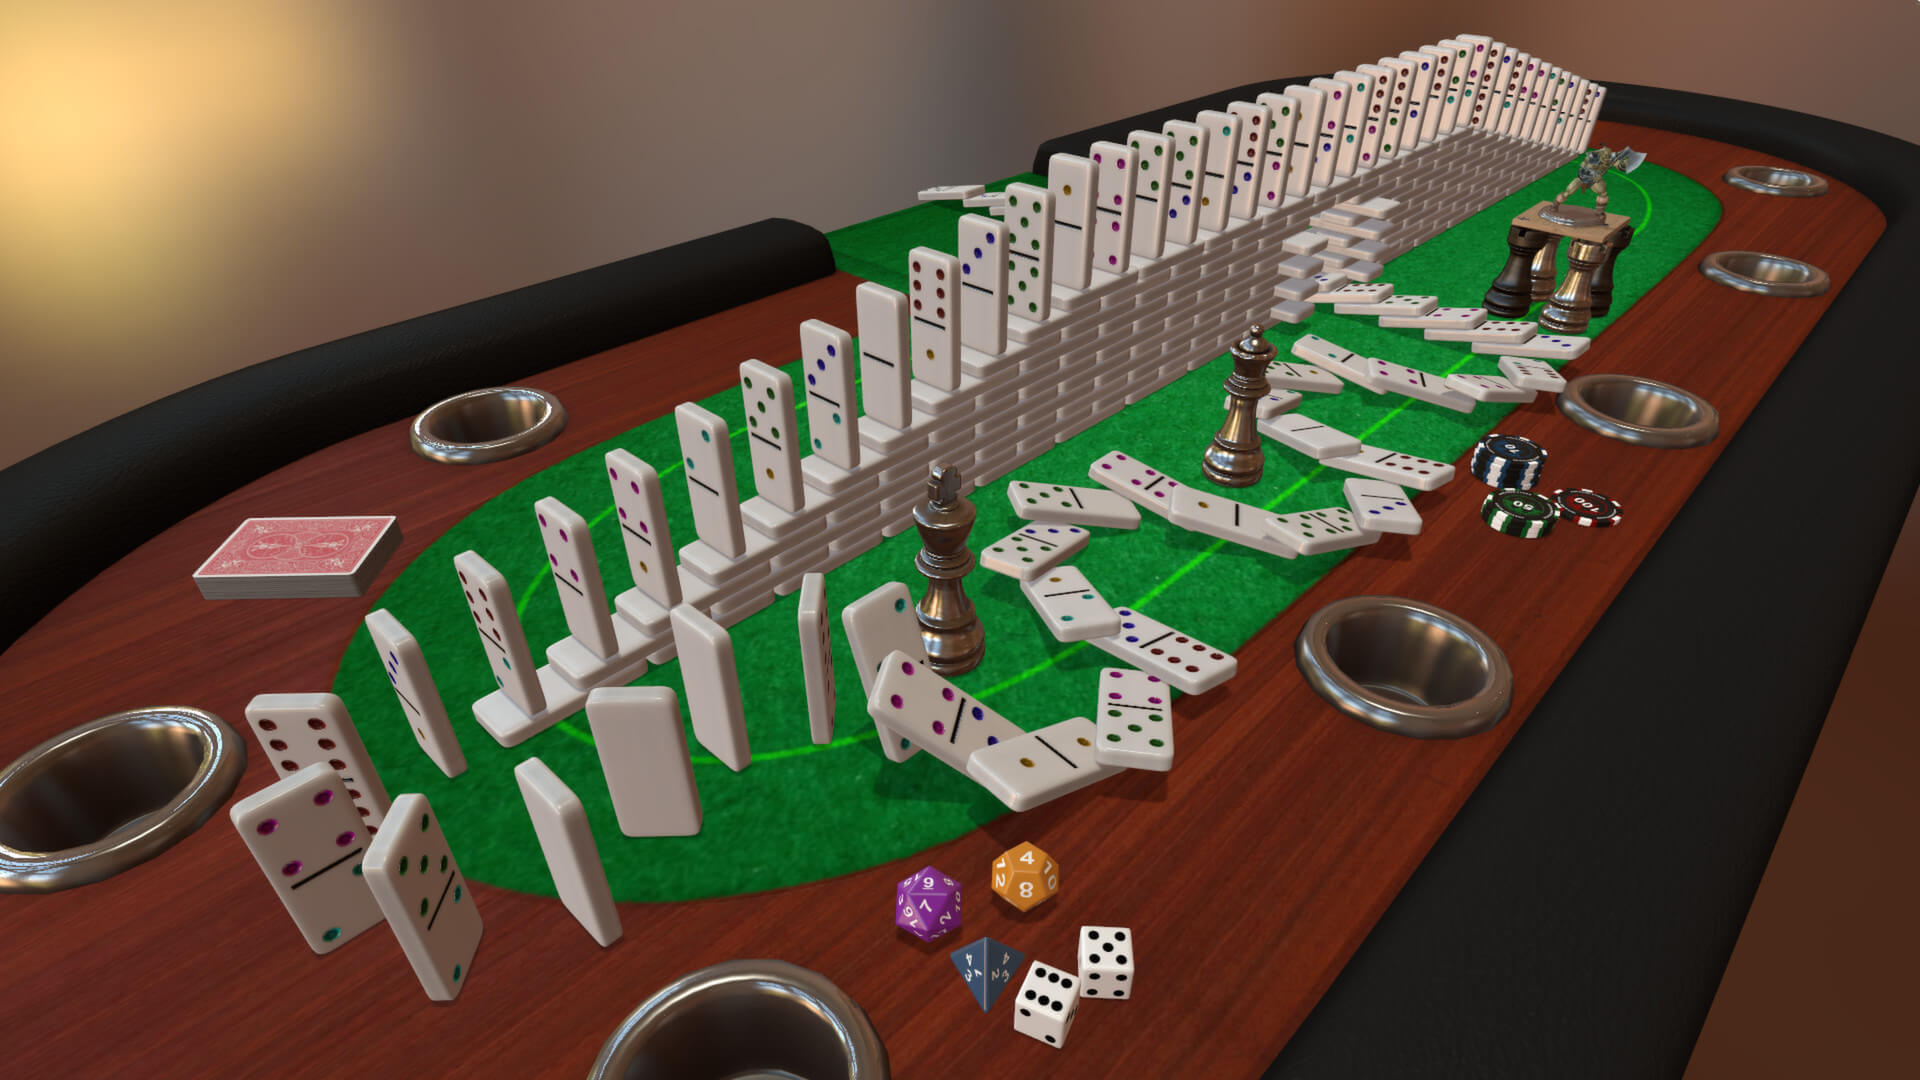 Tabletop simulator steam